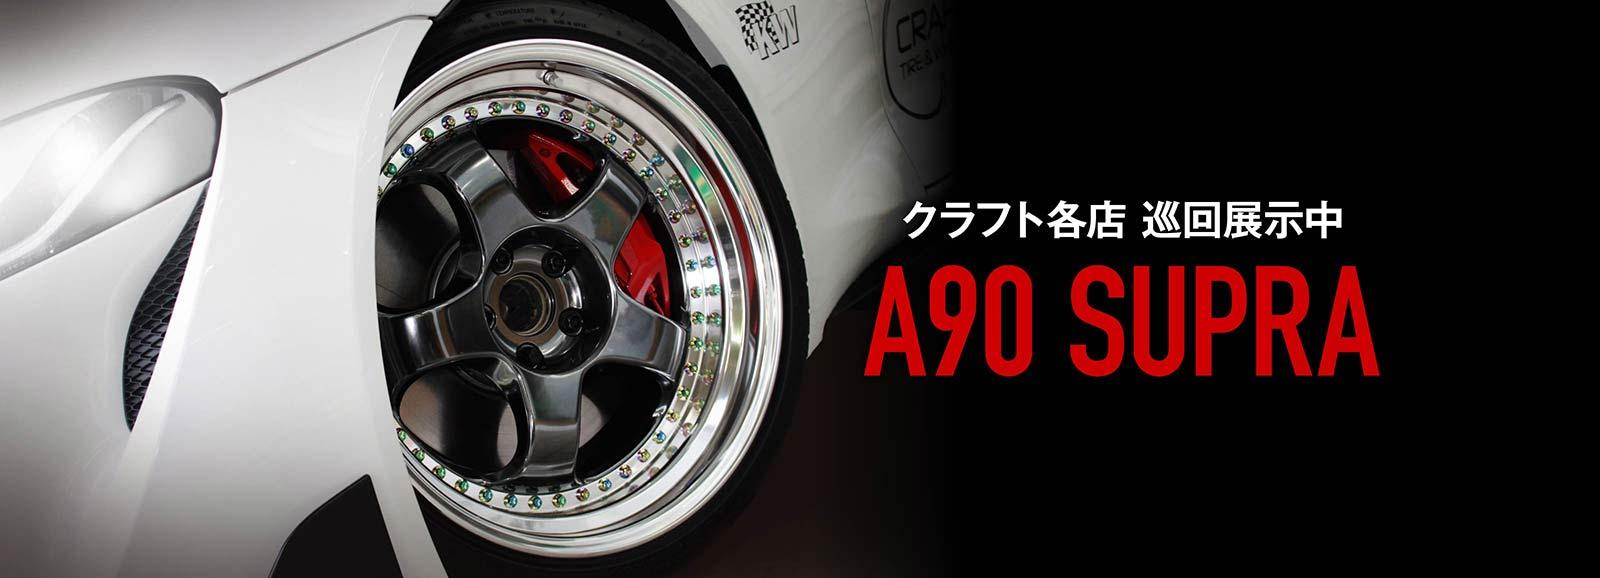 A90スープラ クラフト各店巡回展示中